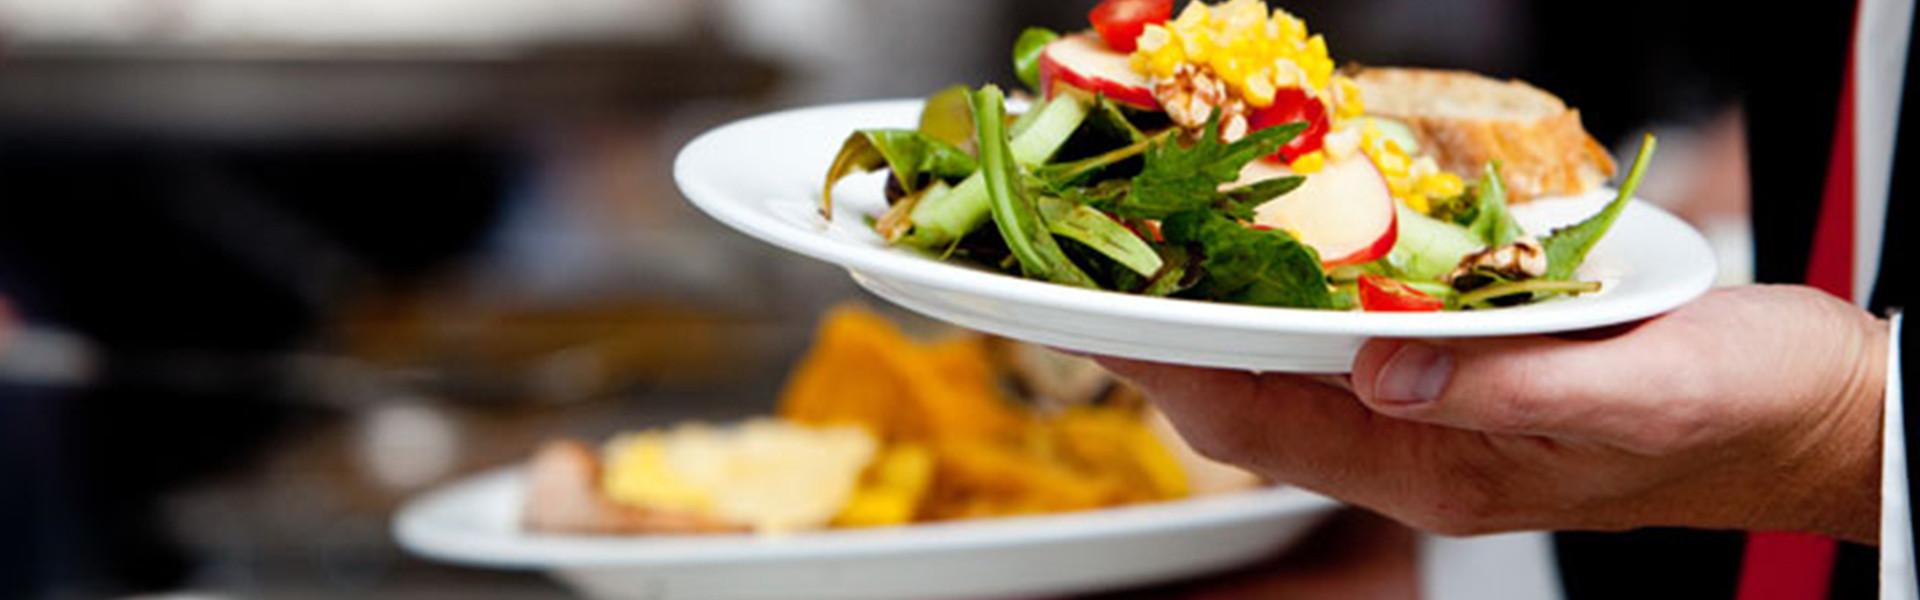 Foodie Tuesdays | Westgate Las Vegas Resort & Casino